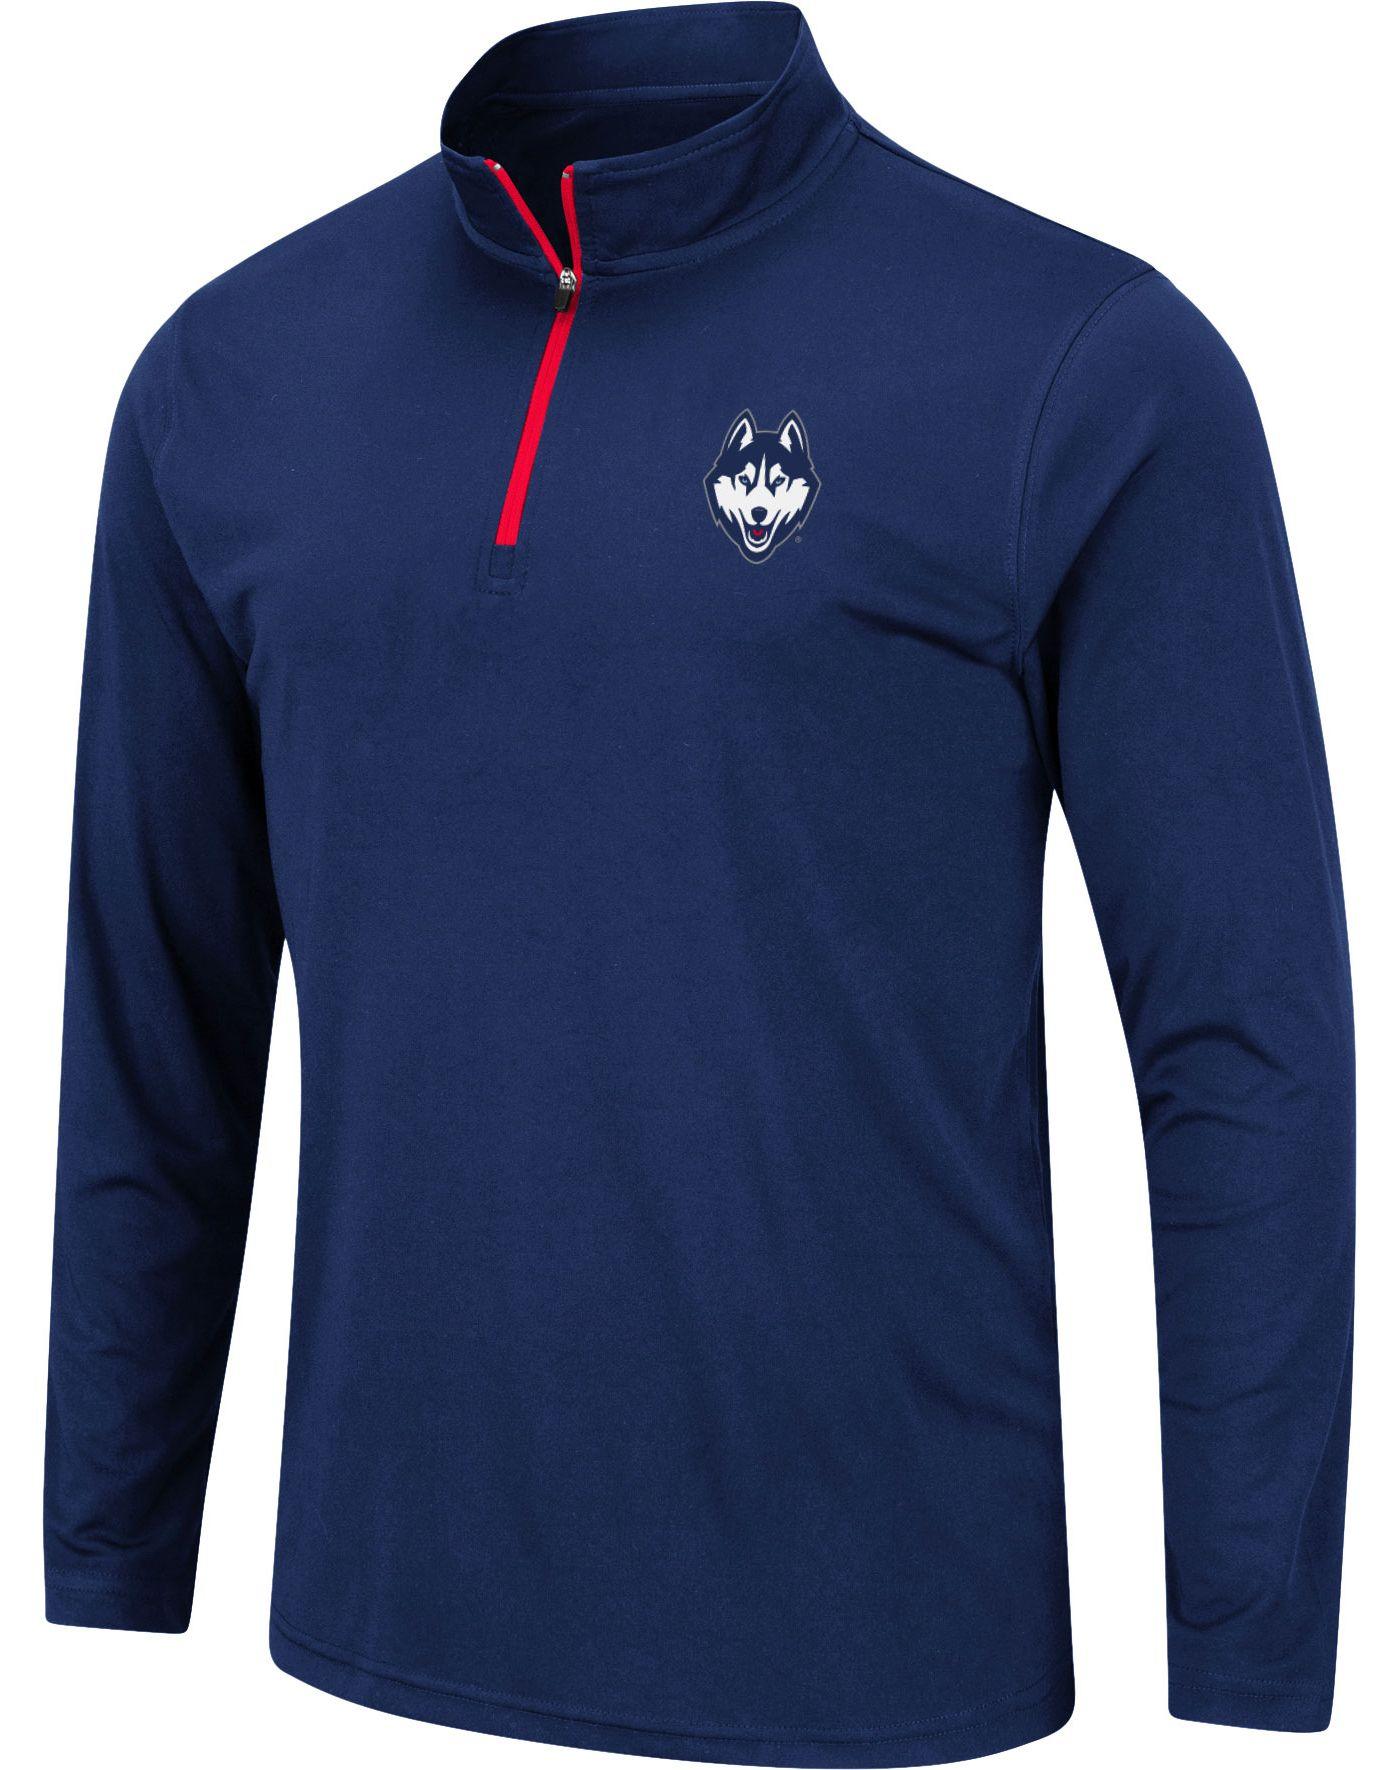 Colosseum Men's UConn Huskies Blue Quarter-Zip Shirt